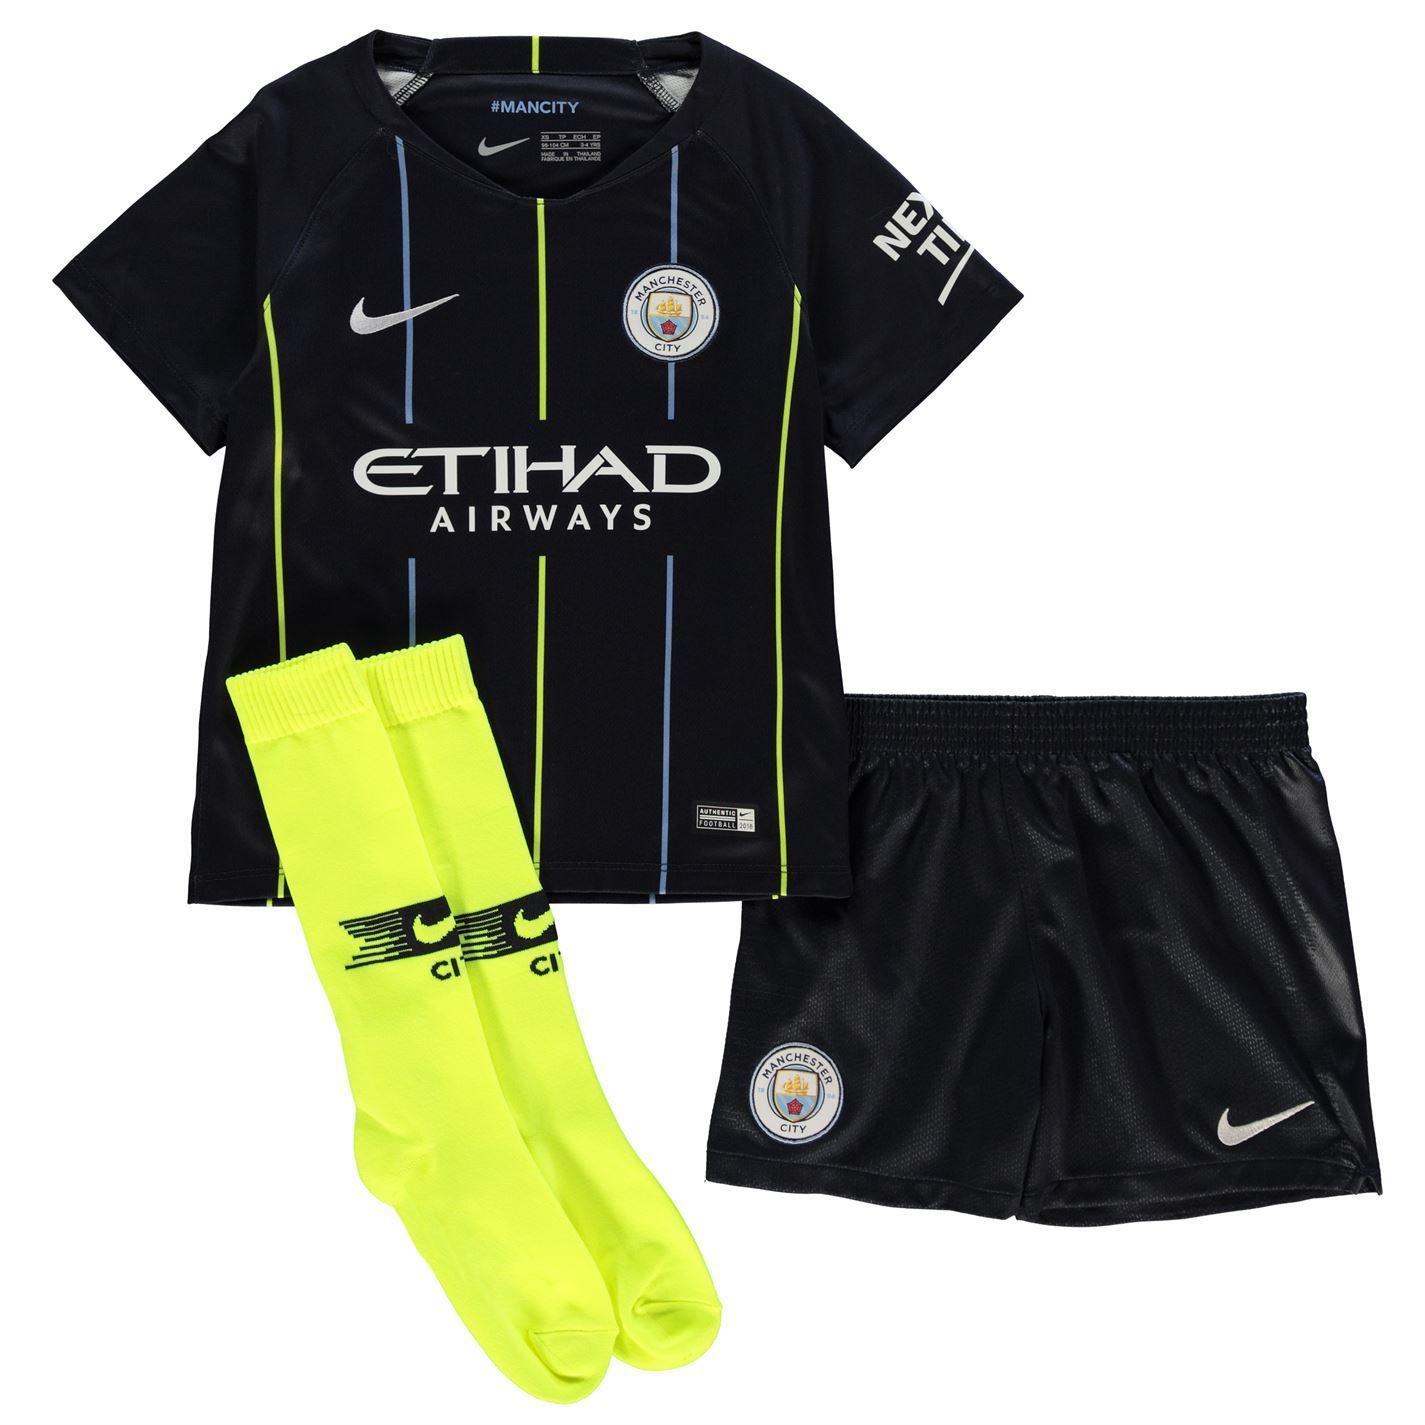 fe8f222aa Cheapest Man City Football Shirts - DREAMWORKS